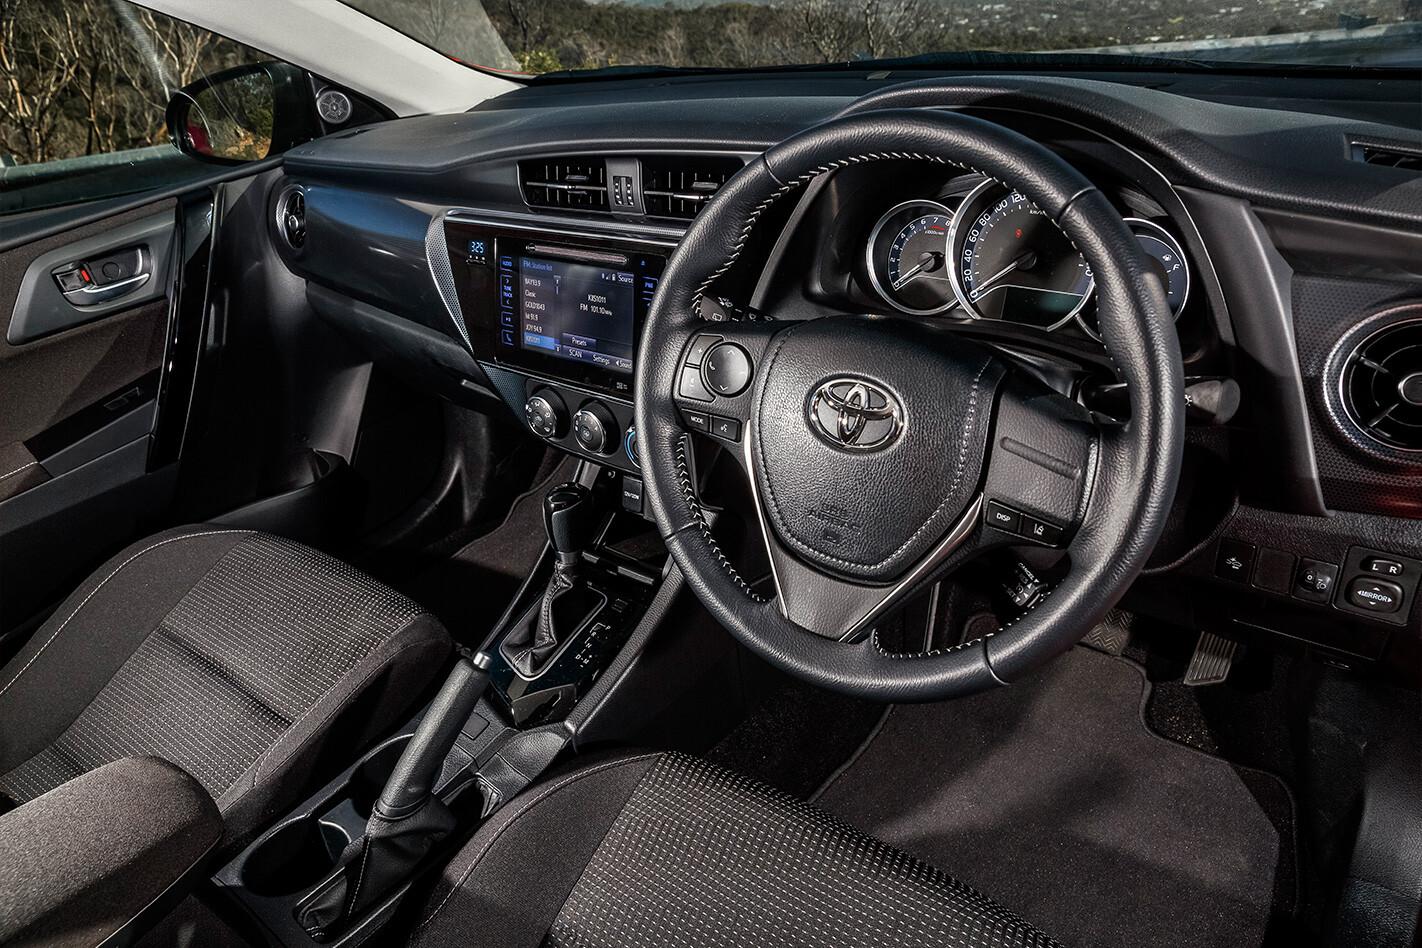 Hatchback Three Way Toyota Corolla Interior Jpg